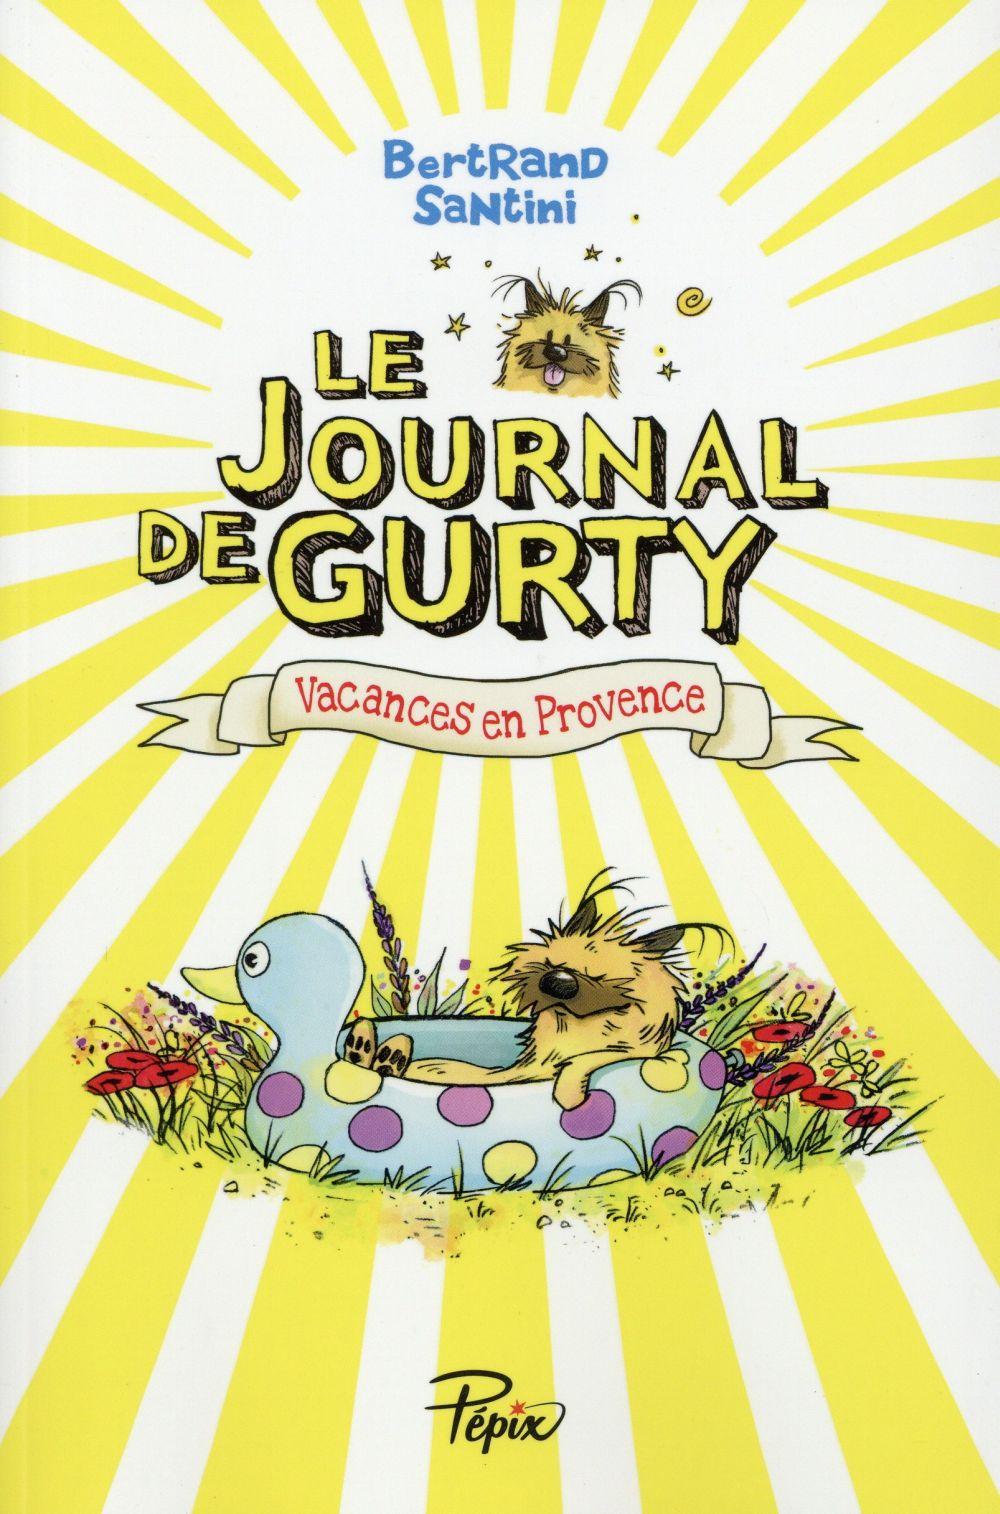 LE JOURNAL DE GURTY - VACANCES EN PROVENCE Santini Bertrand Ed. Sarbacane